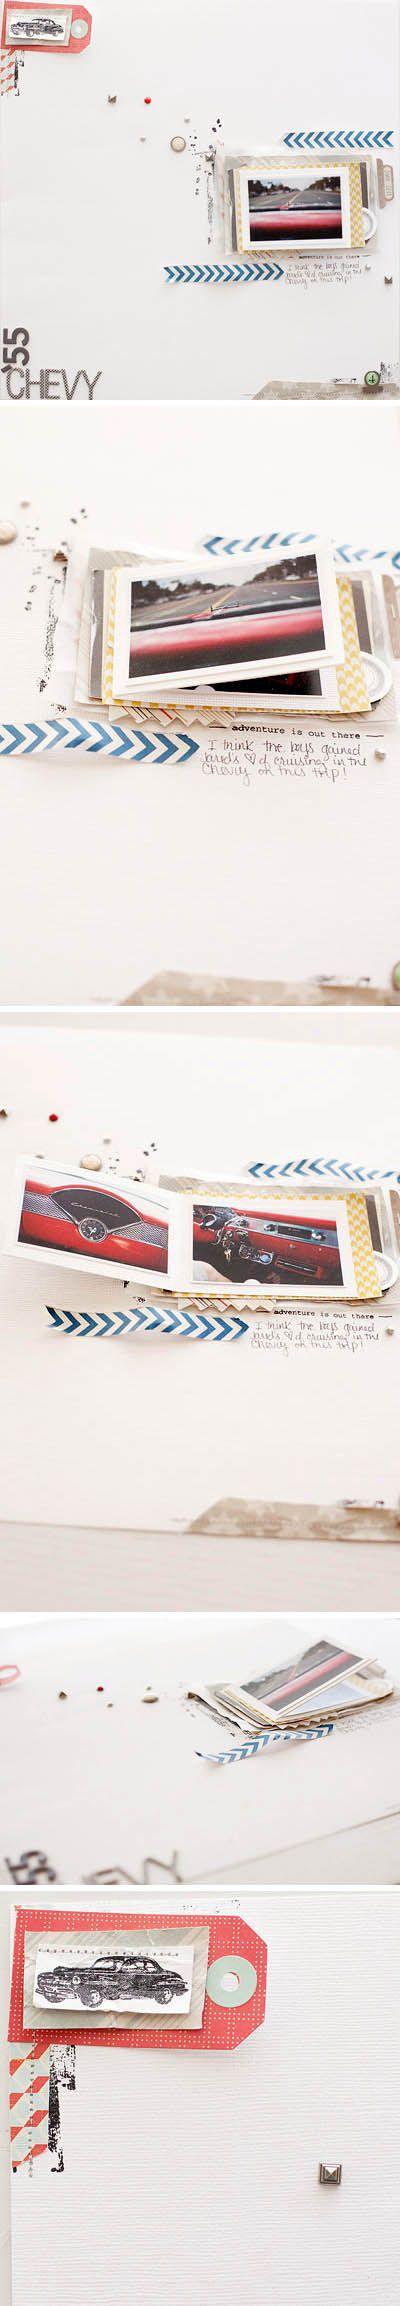 scrap: Scrapbook Layouts, Mini Album, Papercraft Scrapbook, 400 2 306 Pixel, Scrap Layout, Scrapbooking Layouts